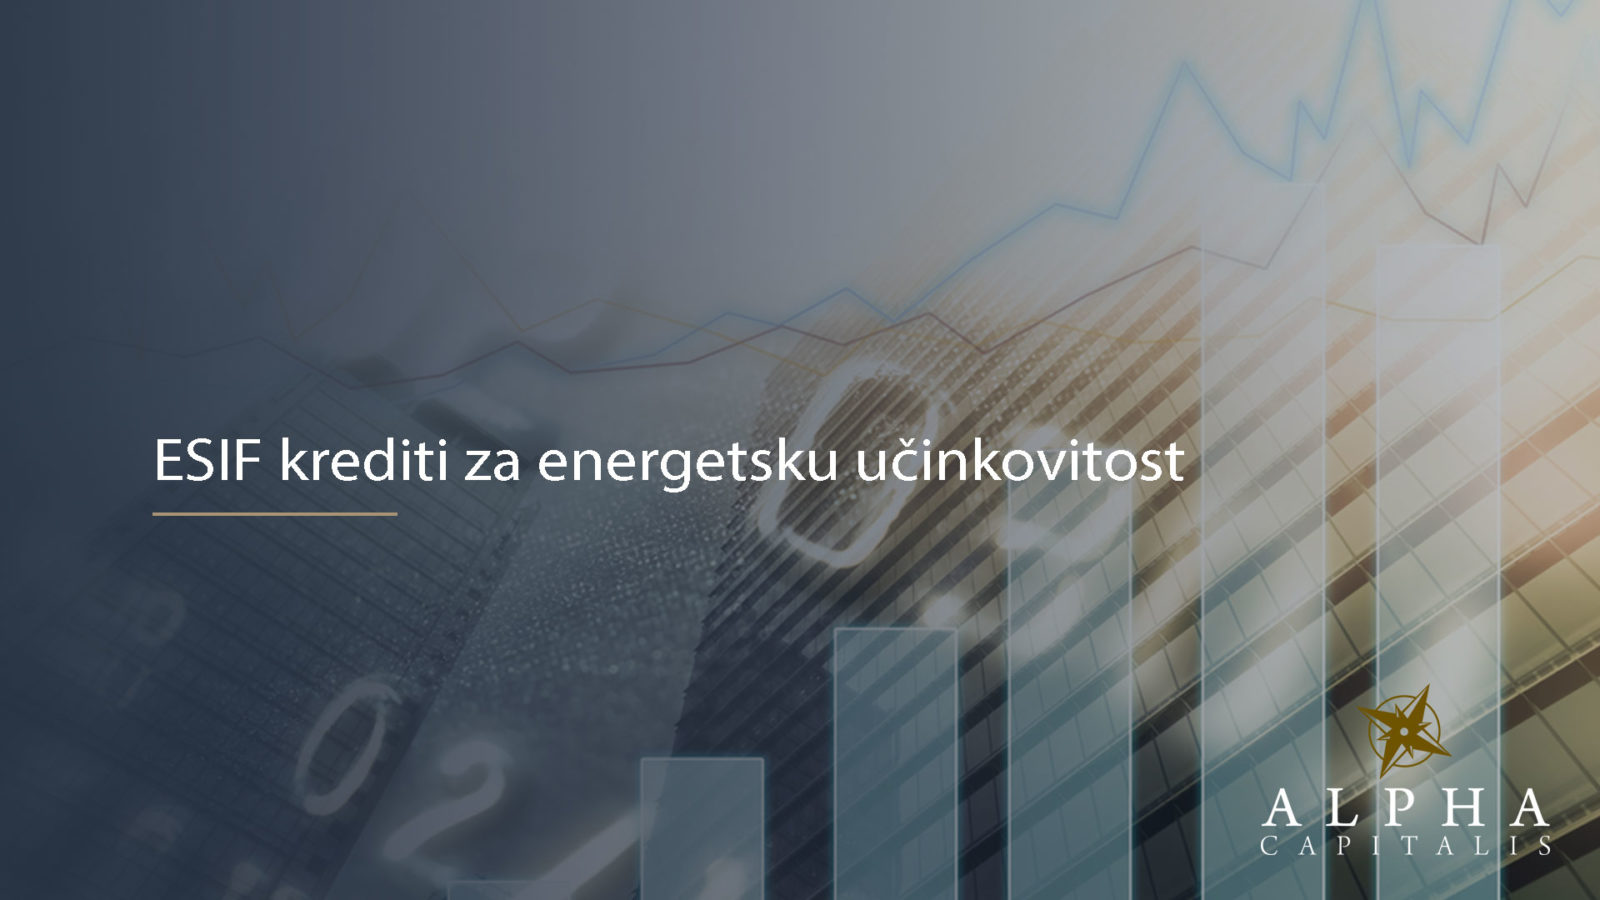 ESIF krediti za energetsku ucinkovitost 2019 04 09 - ESIF krediti za energetsku učinkovitost za poduzetnike